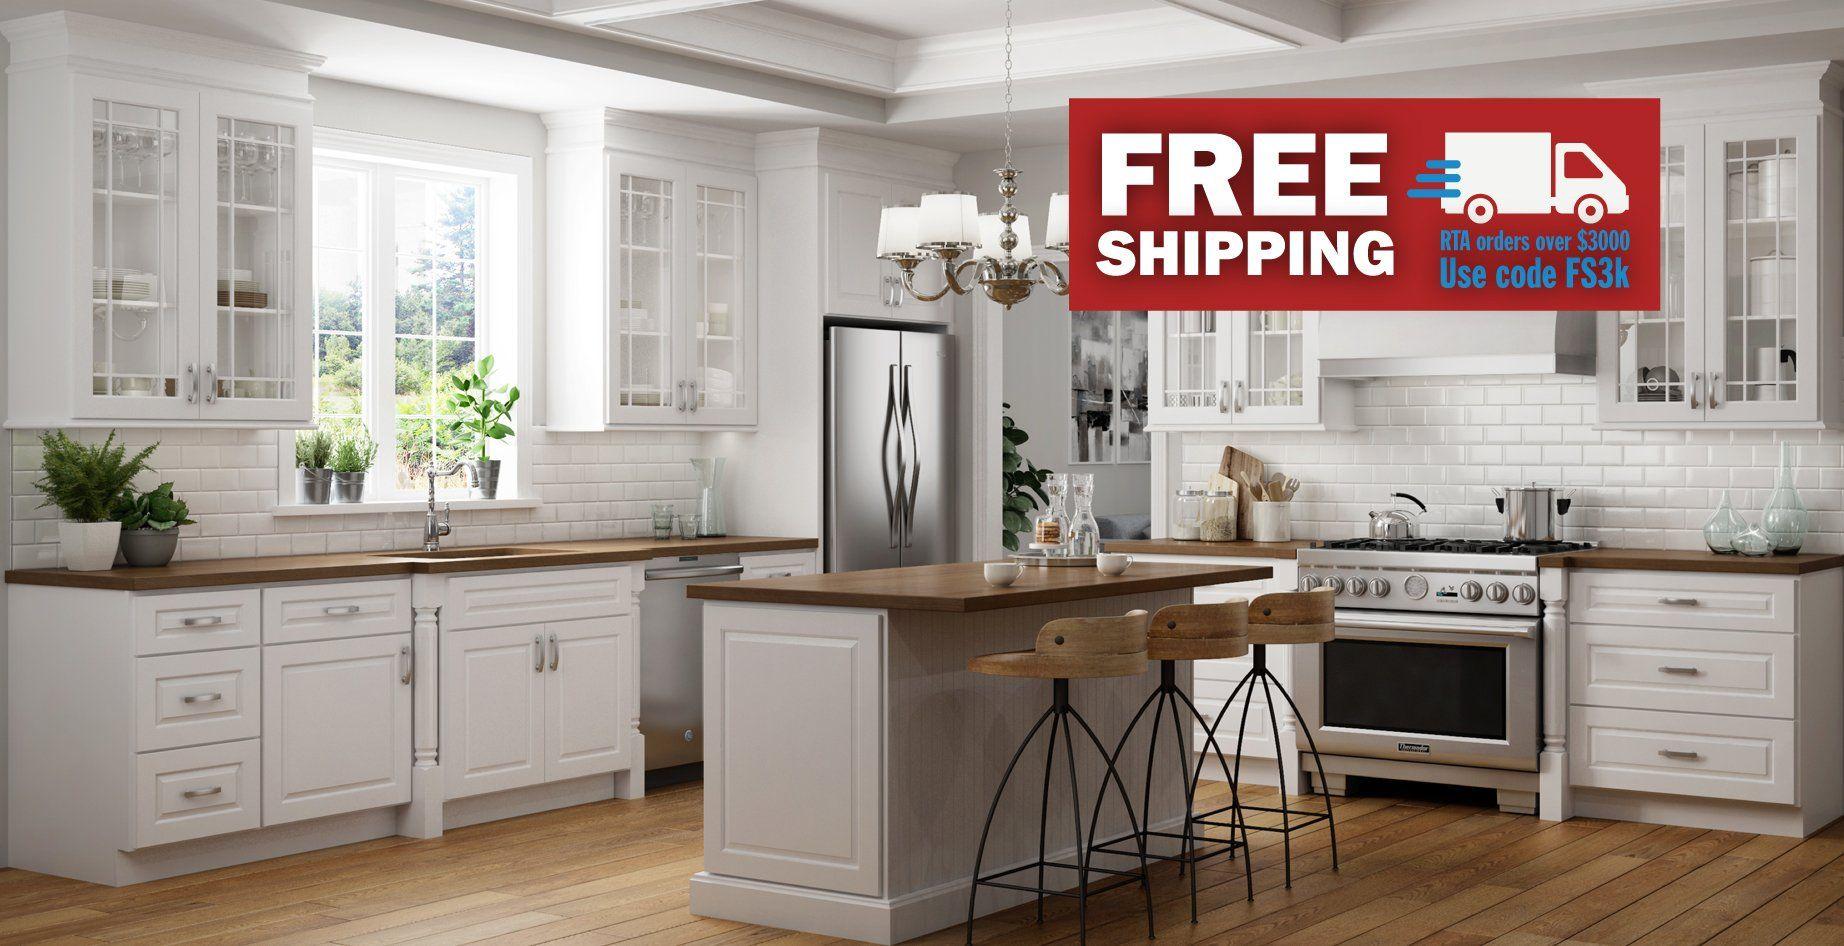 RTA Wood Cabinets | Ready To Assemble Kitchen Cabinets ...